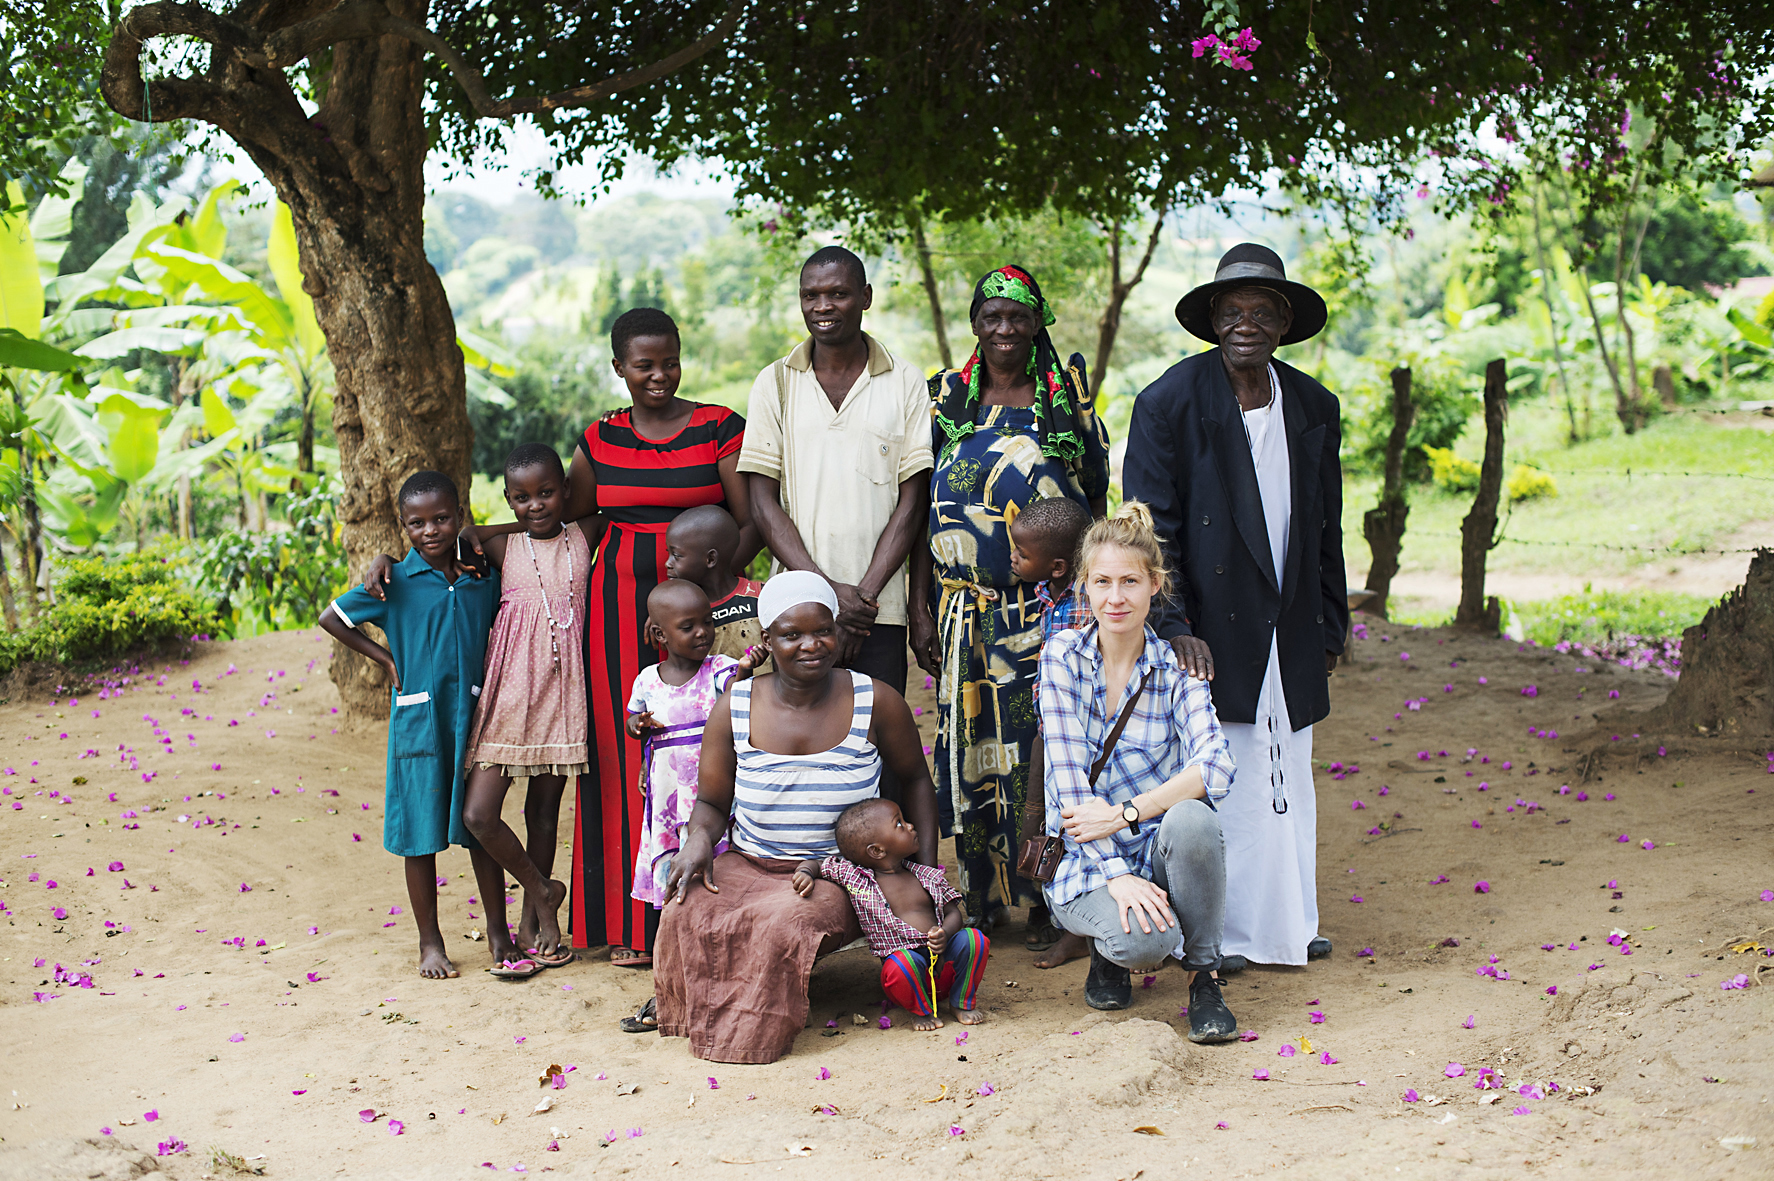 Das Afrika Kochbuch, Maria Schiffer, Eating with Africa